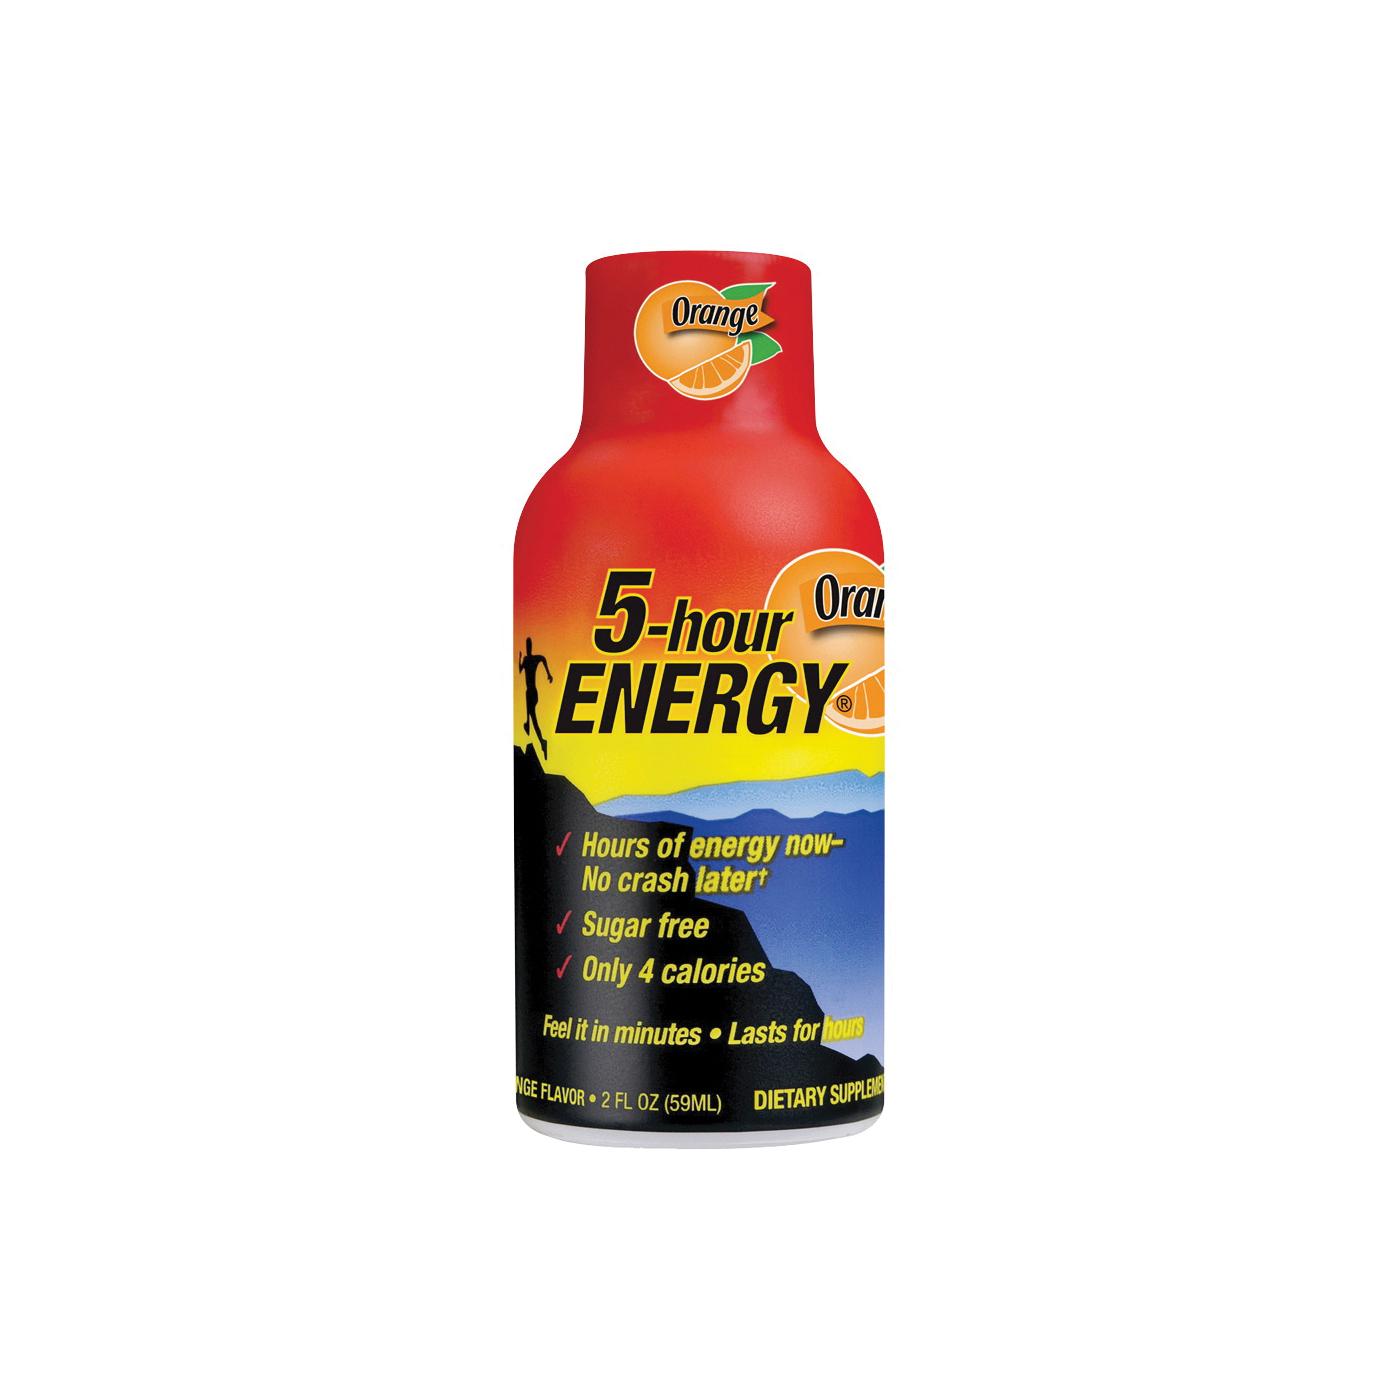 Picture of 5-hour ENERGY 318120 Sugar-Free Energy Drink, Liquid, Orange Flavor, 1.93 oz Package, Bottle